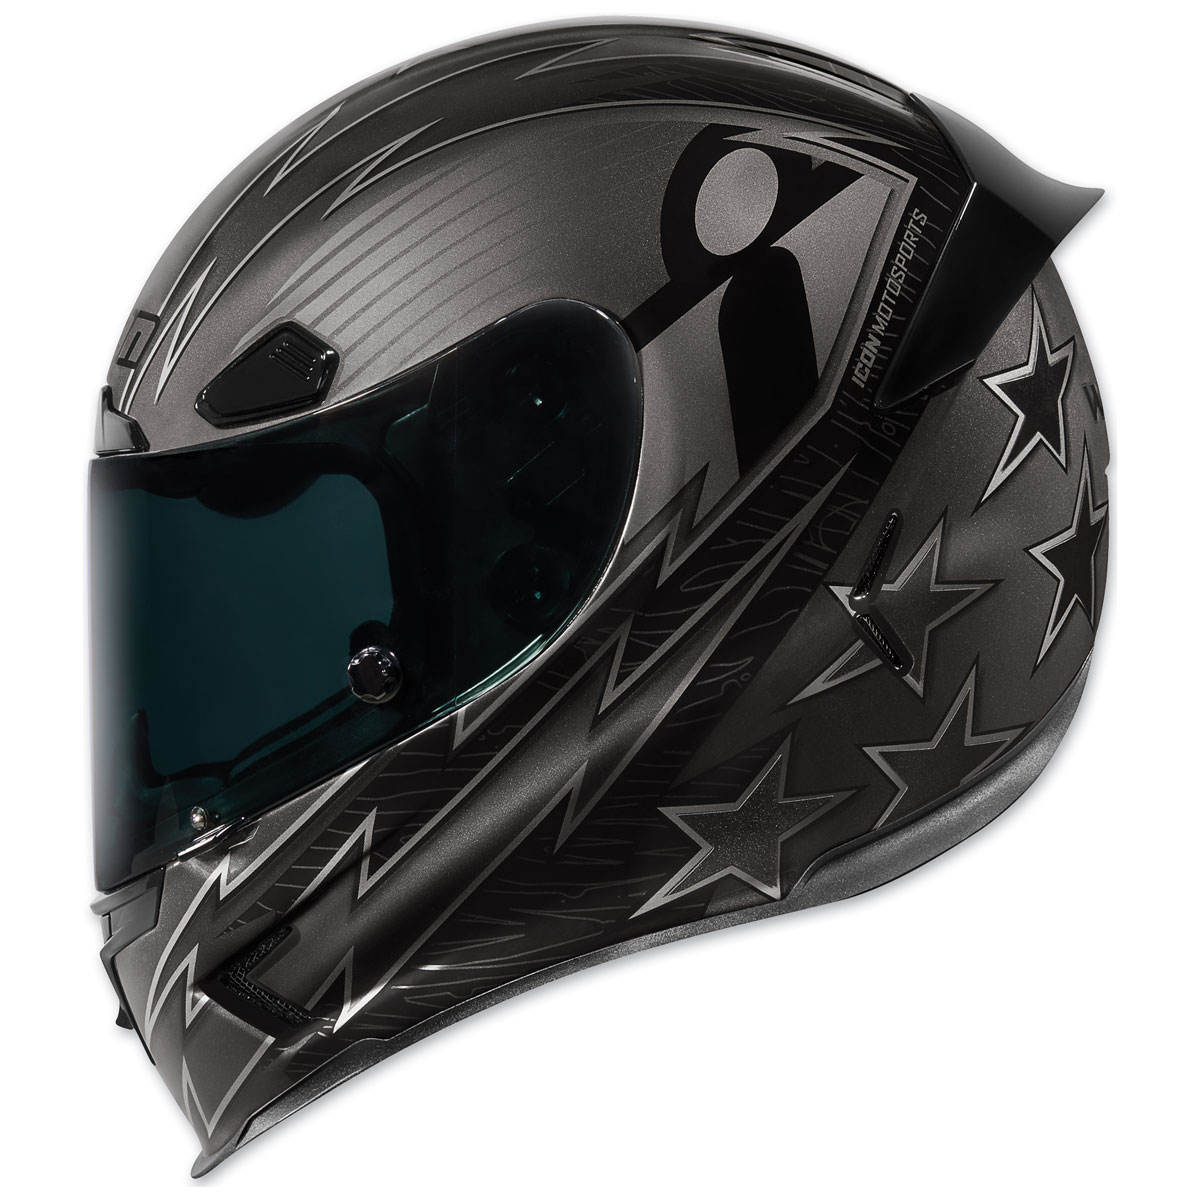 ICON Airframe Pro Warbird Black Full Face Helmet